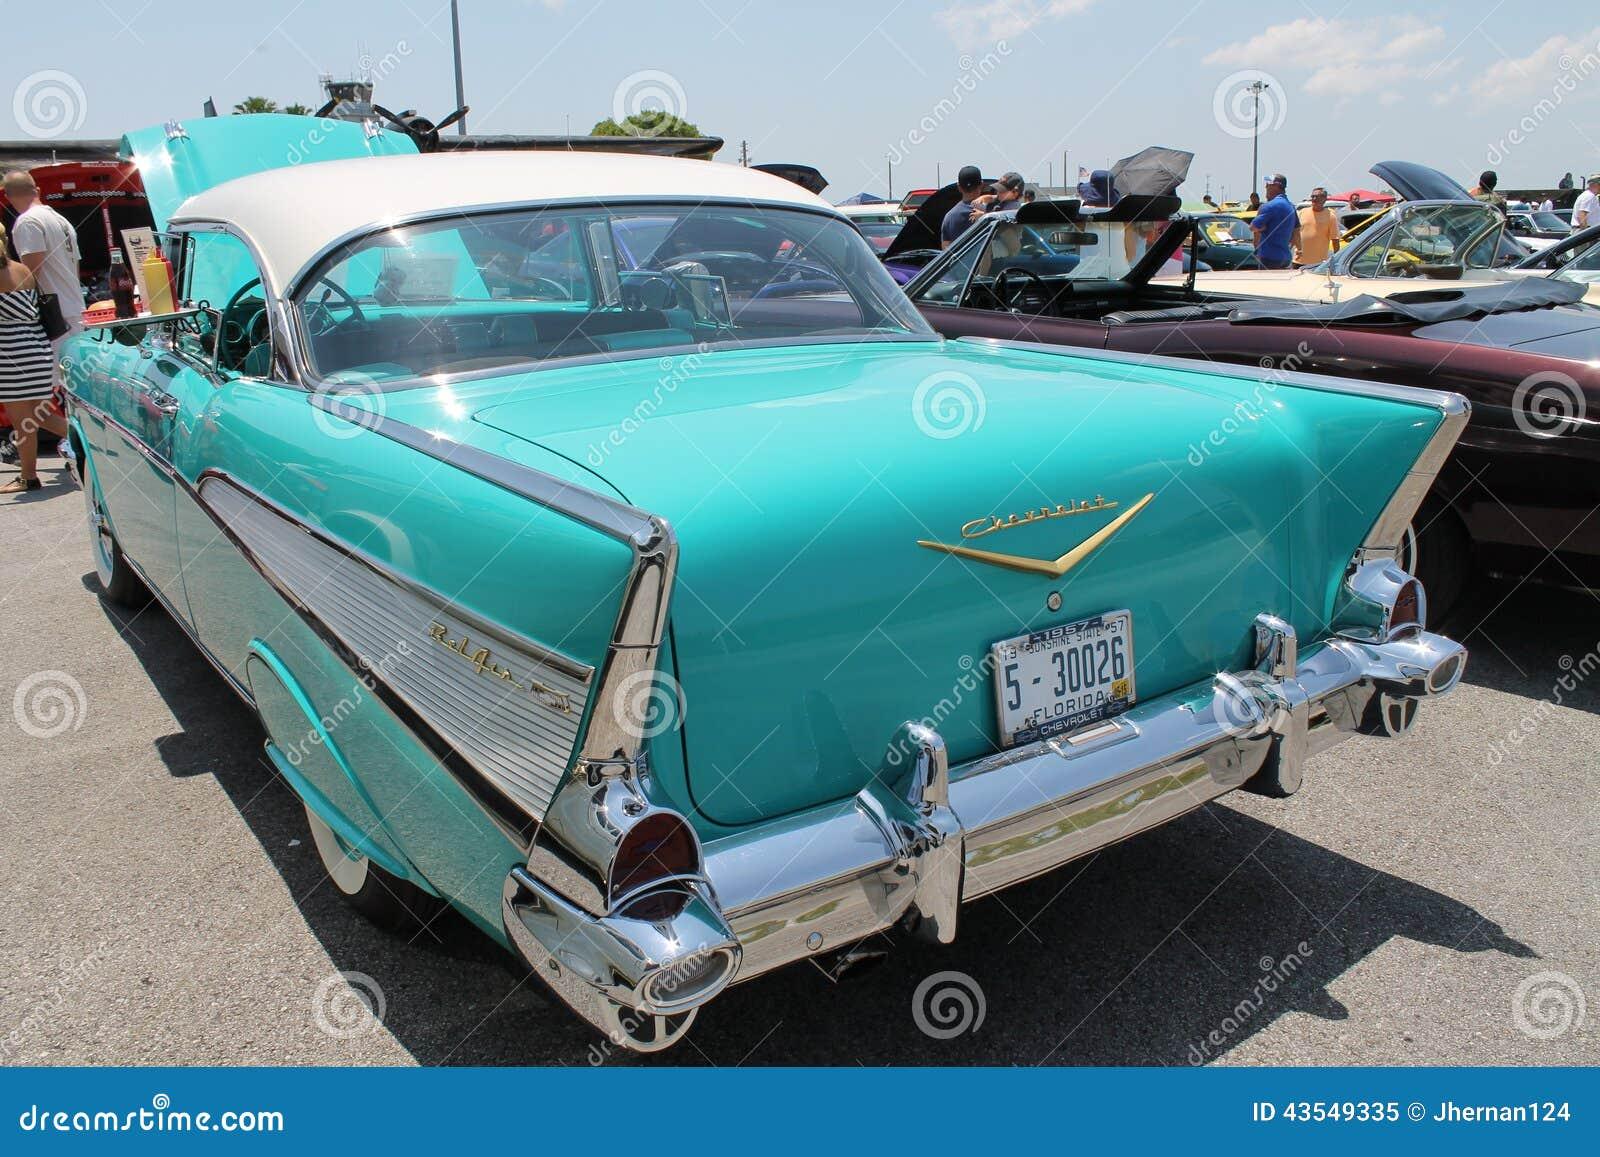 Memorial Day Classic Car Show